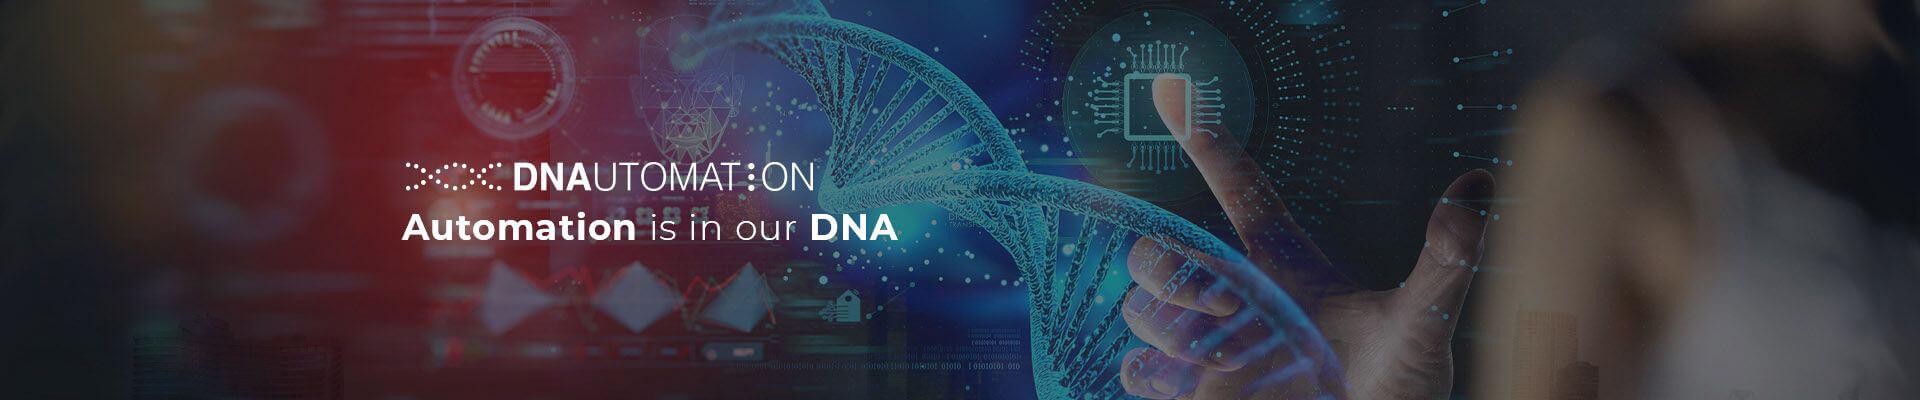 DNA aziendale